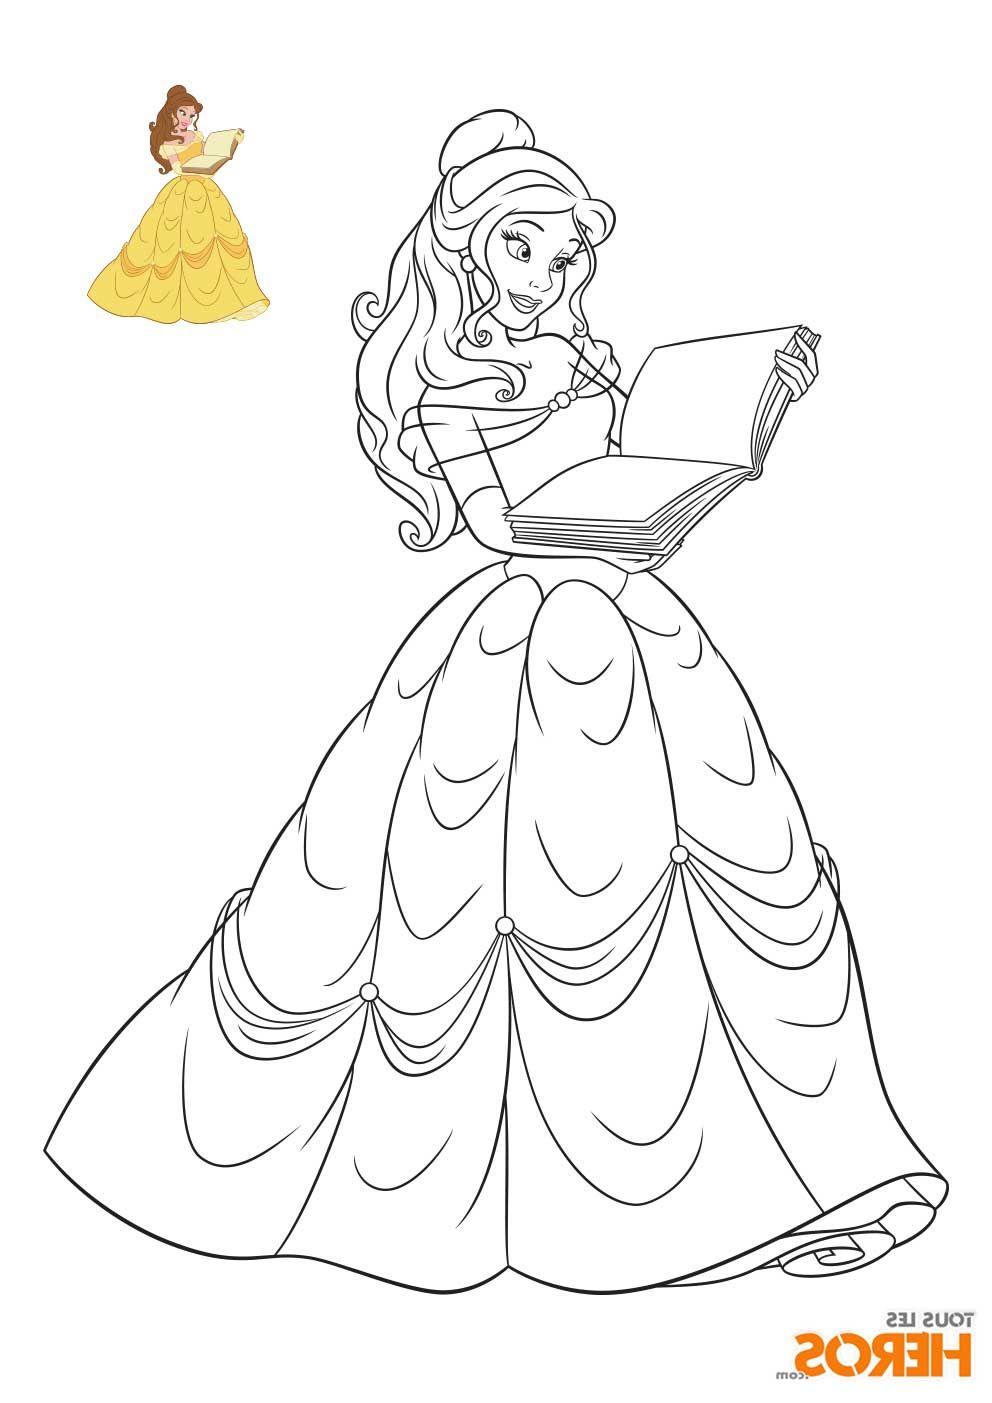 Coloriage De Princesse A Imprimer